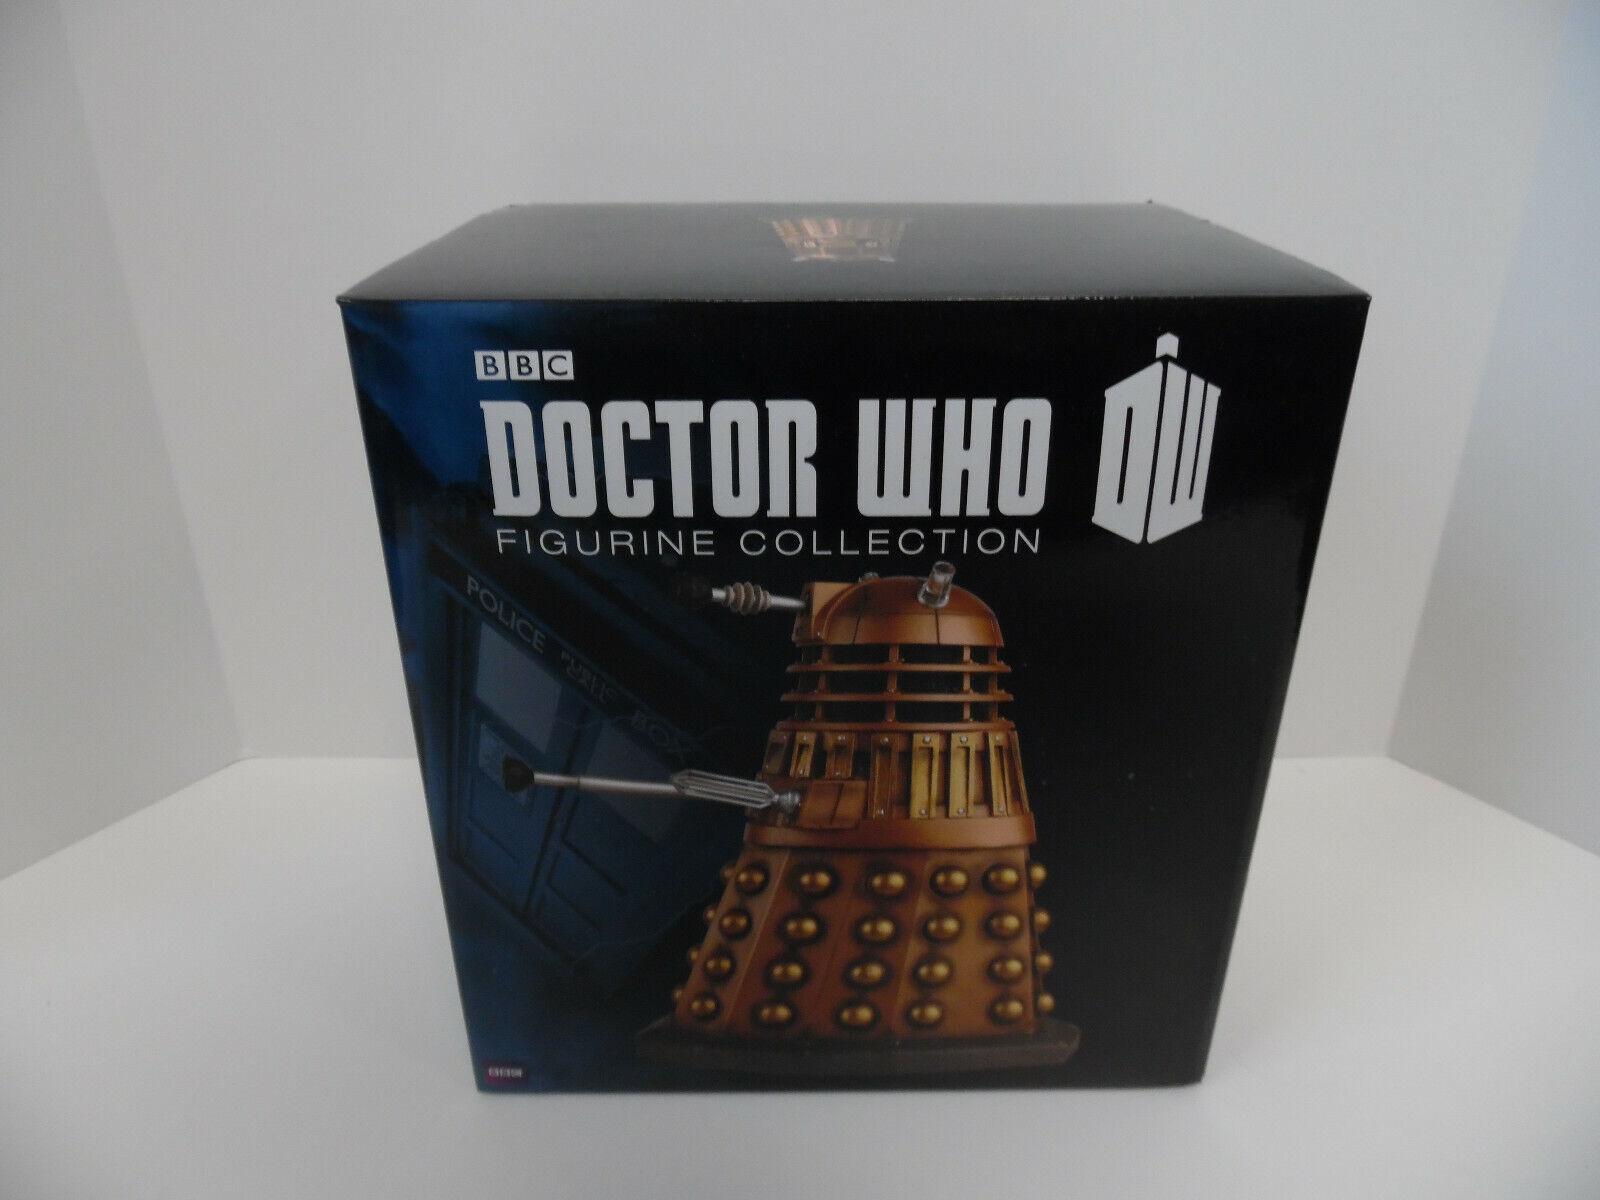 Doctor Who Hero COLLECTOR Mega Special Figure BBC Eaglemoss 2016 8 in (environ 20.32 cm)